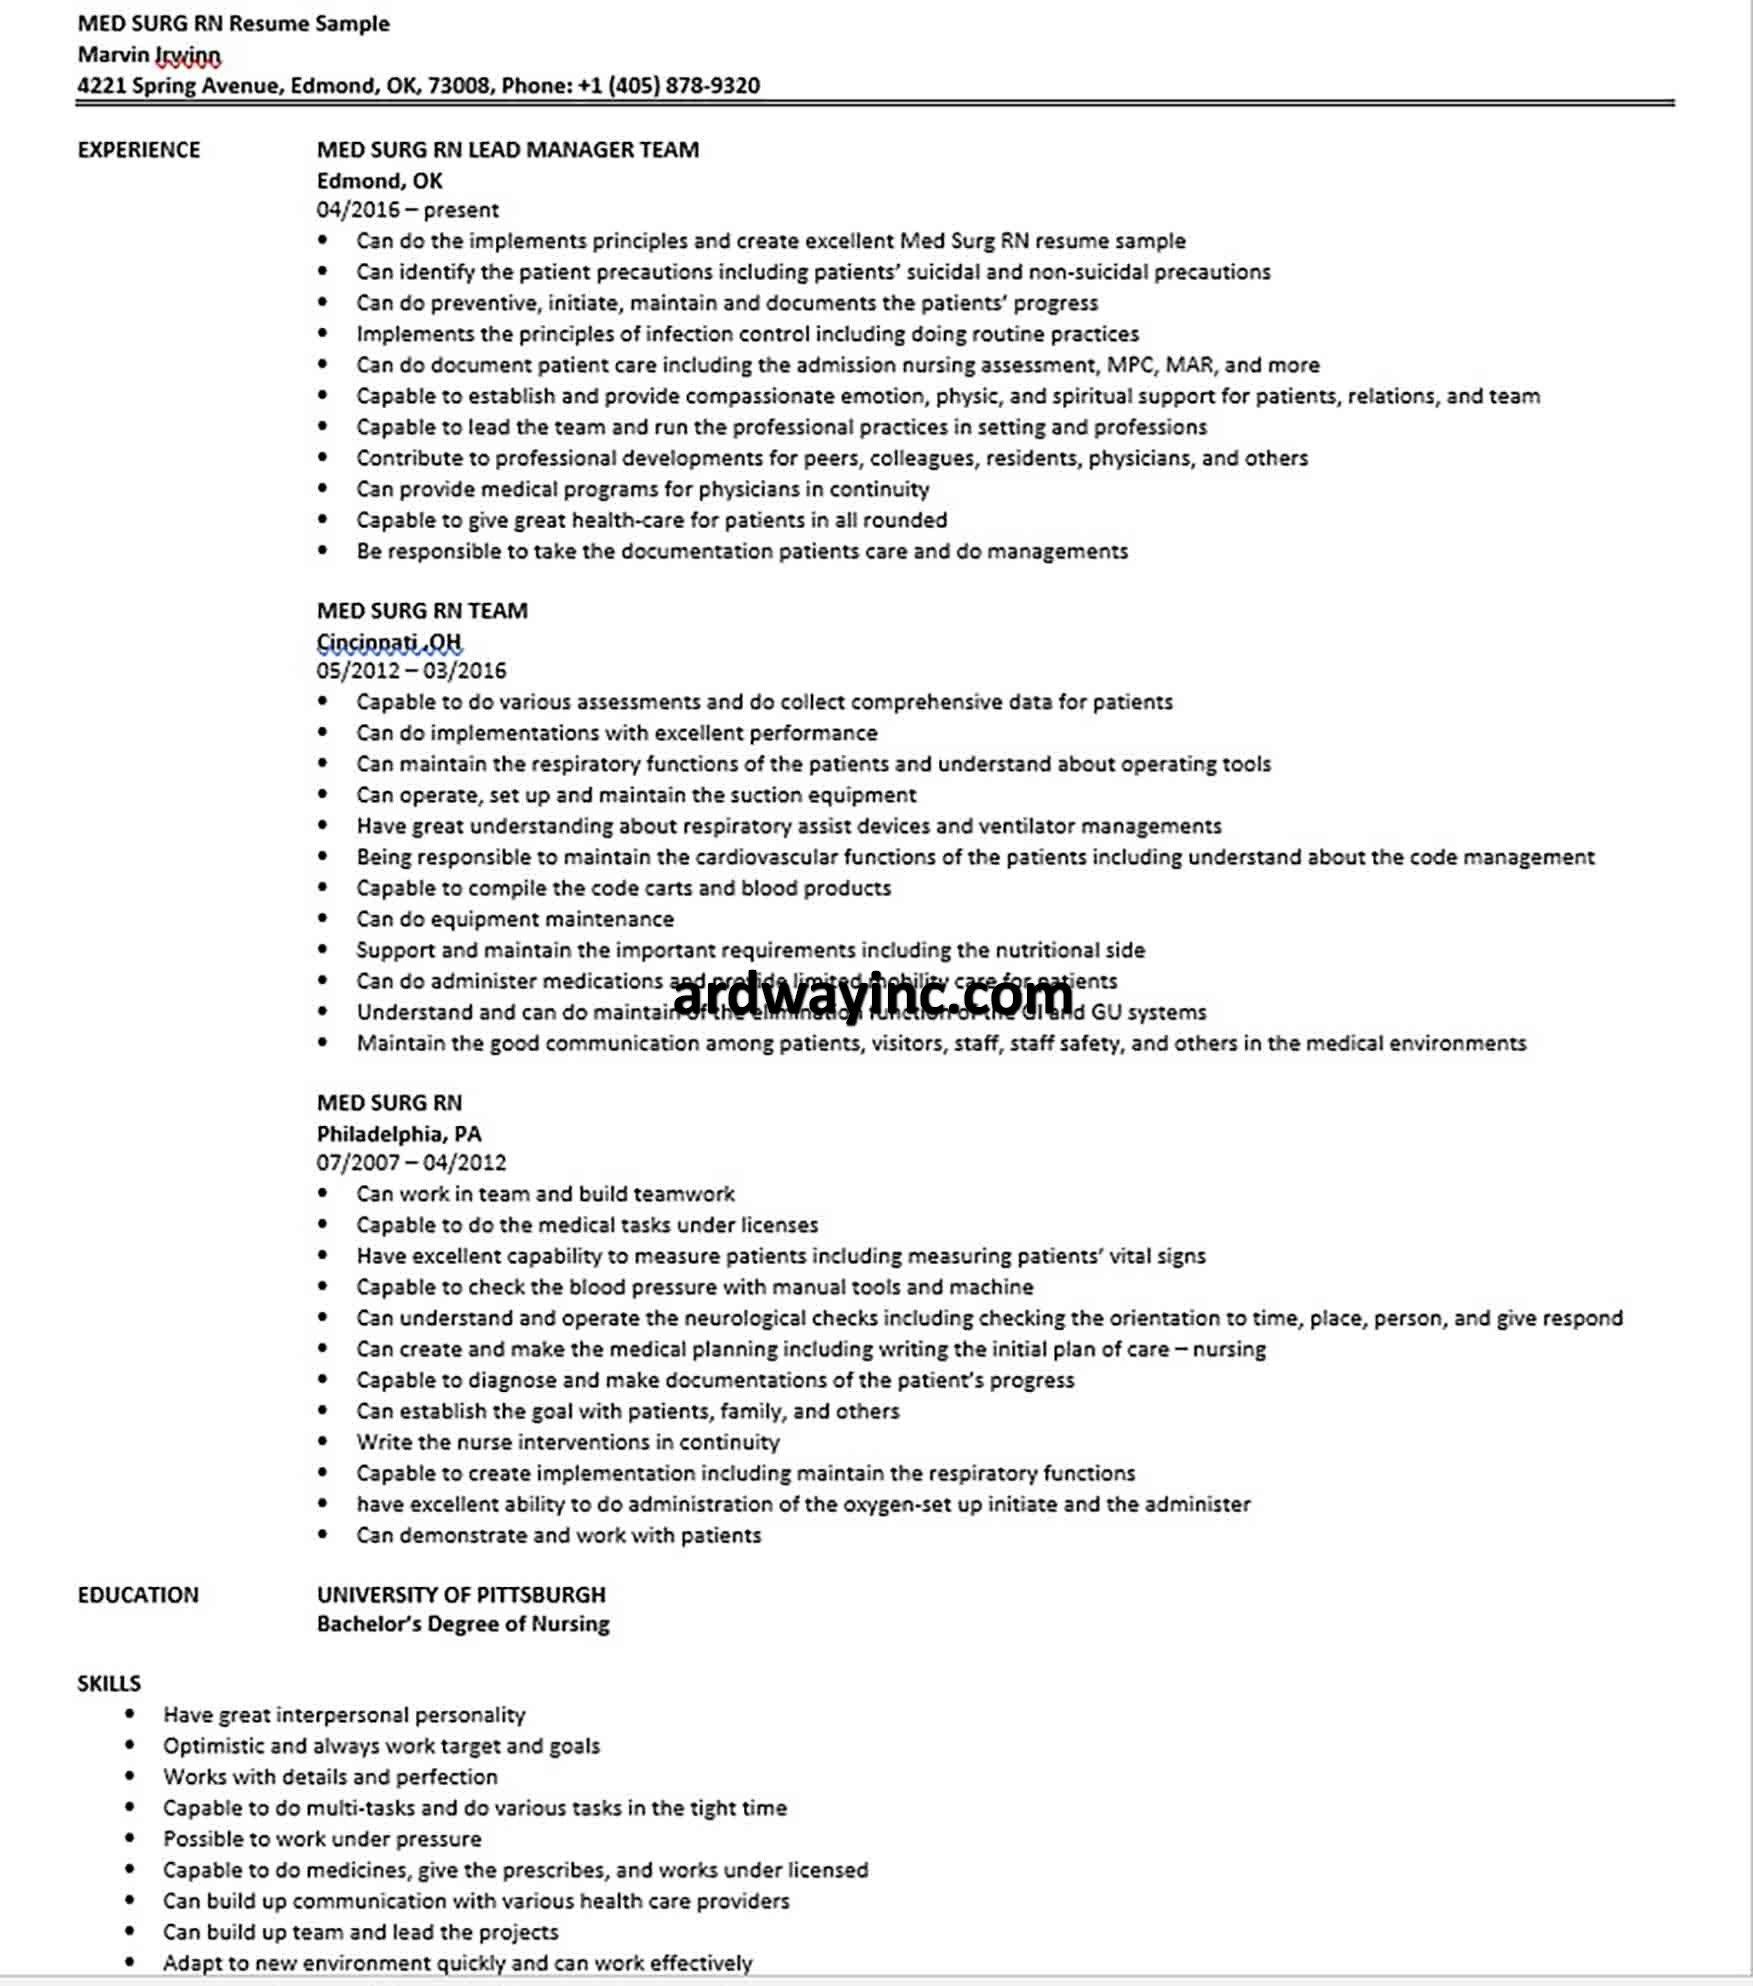 MED SURG RN Resume Sample in 2020 Med surg, Med surg rn